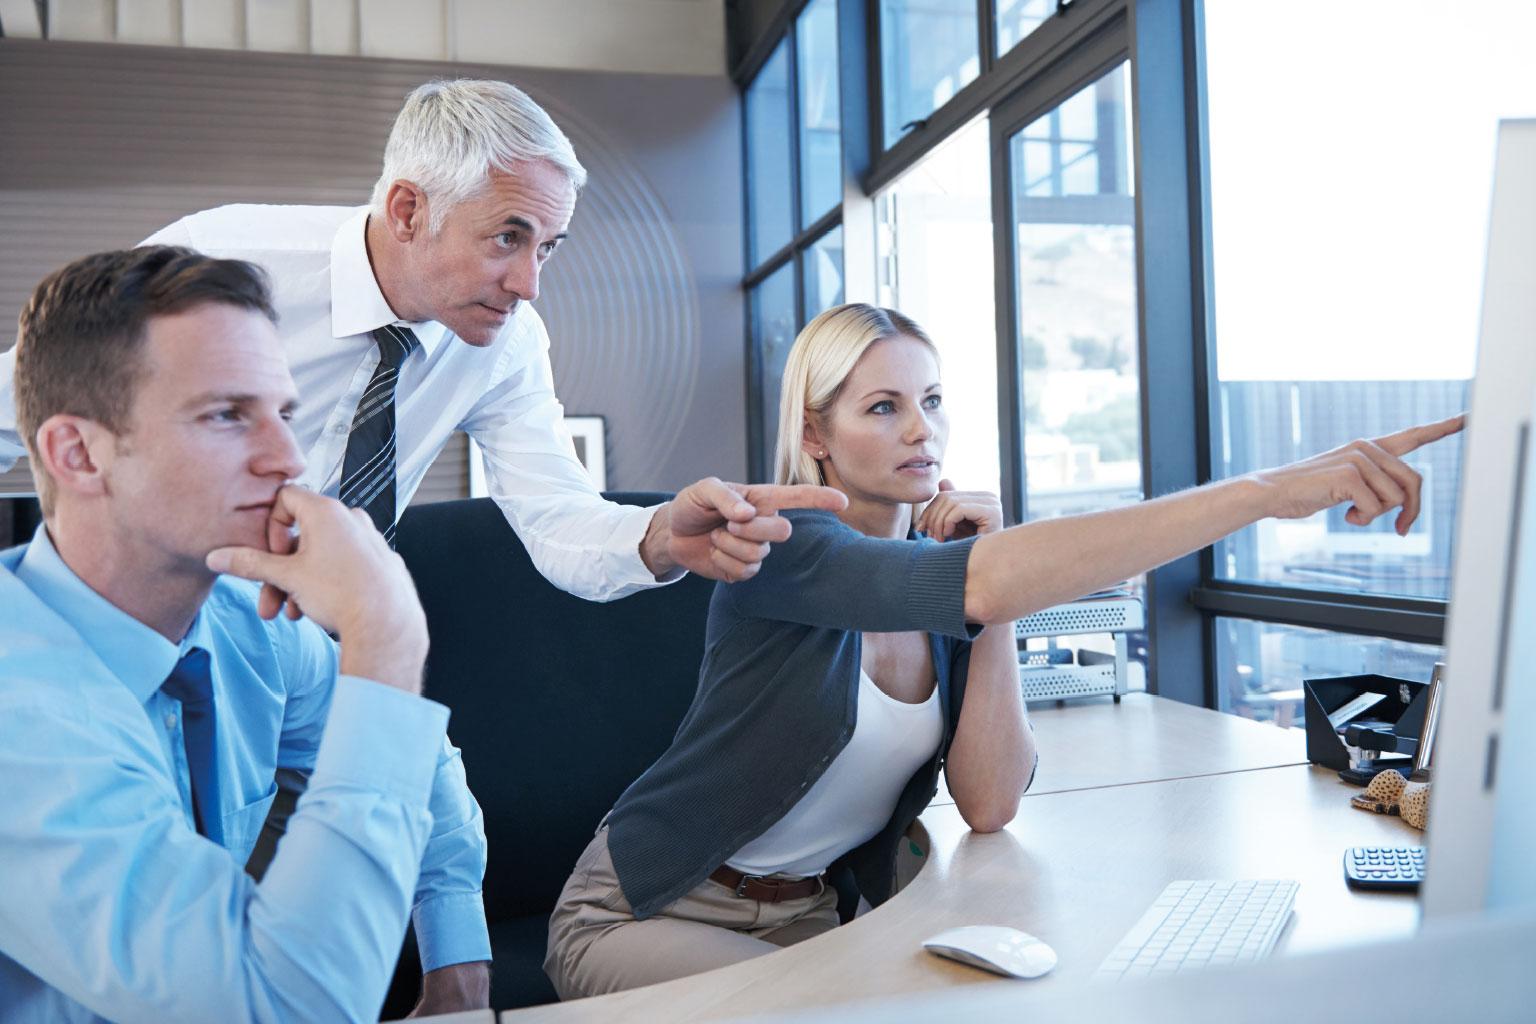 Bezpośredni kontakt z uznanymi ekspertami i praktykami